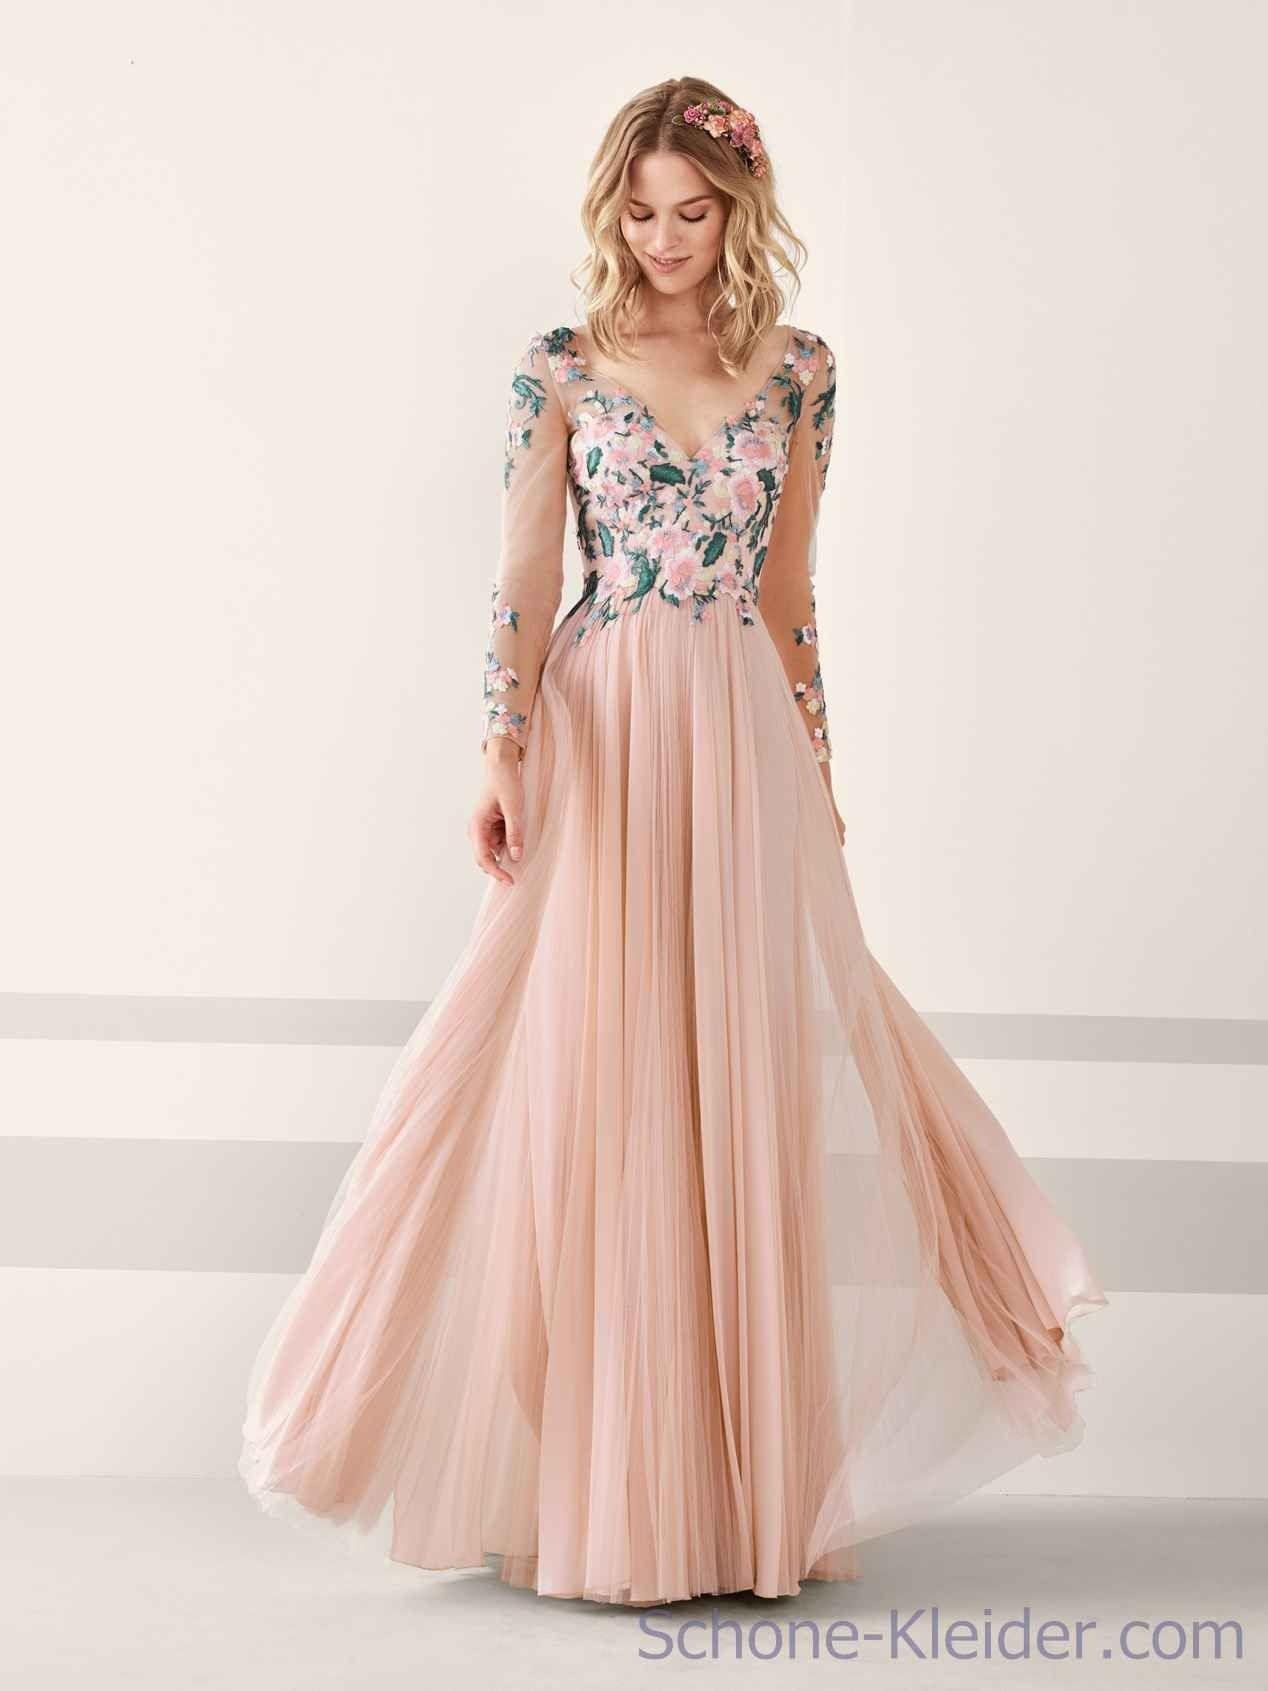 buy online 6acd6 46c8a festliche kleider lang große größen Archives - Abendkleid